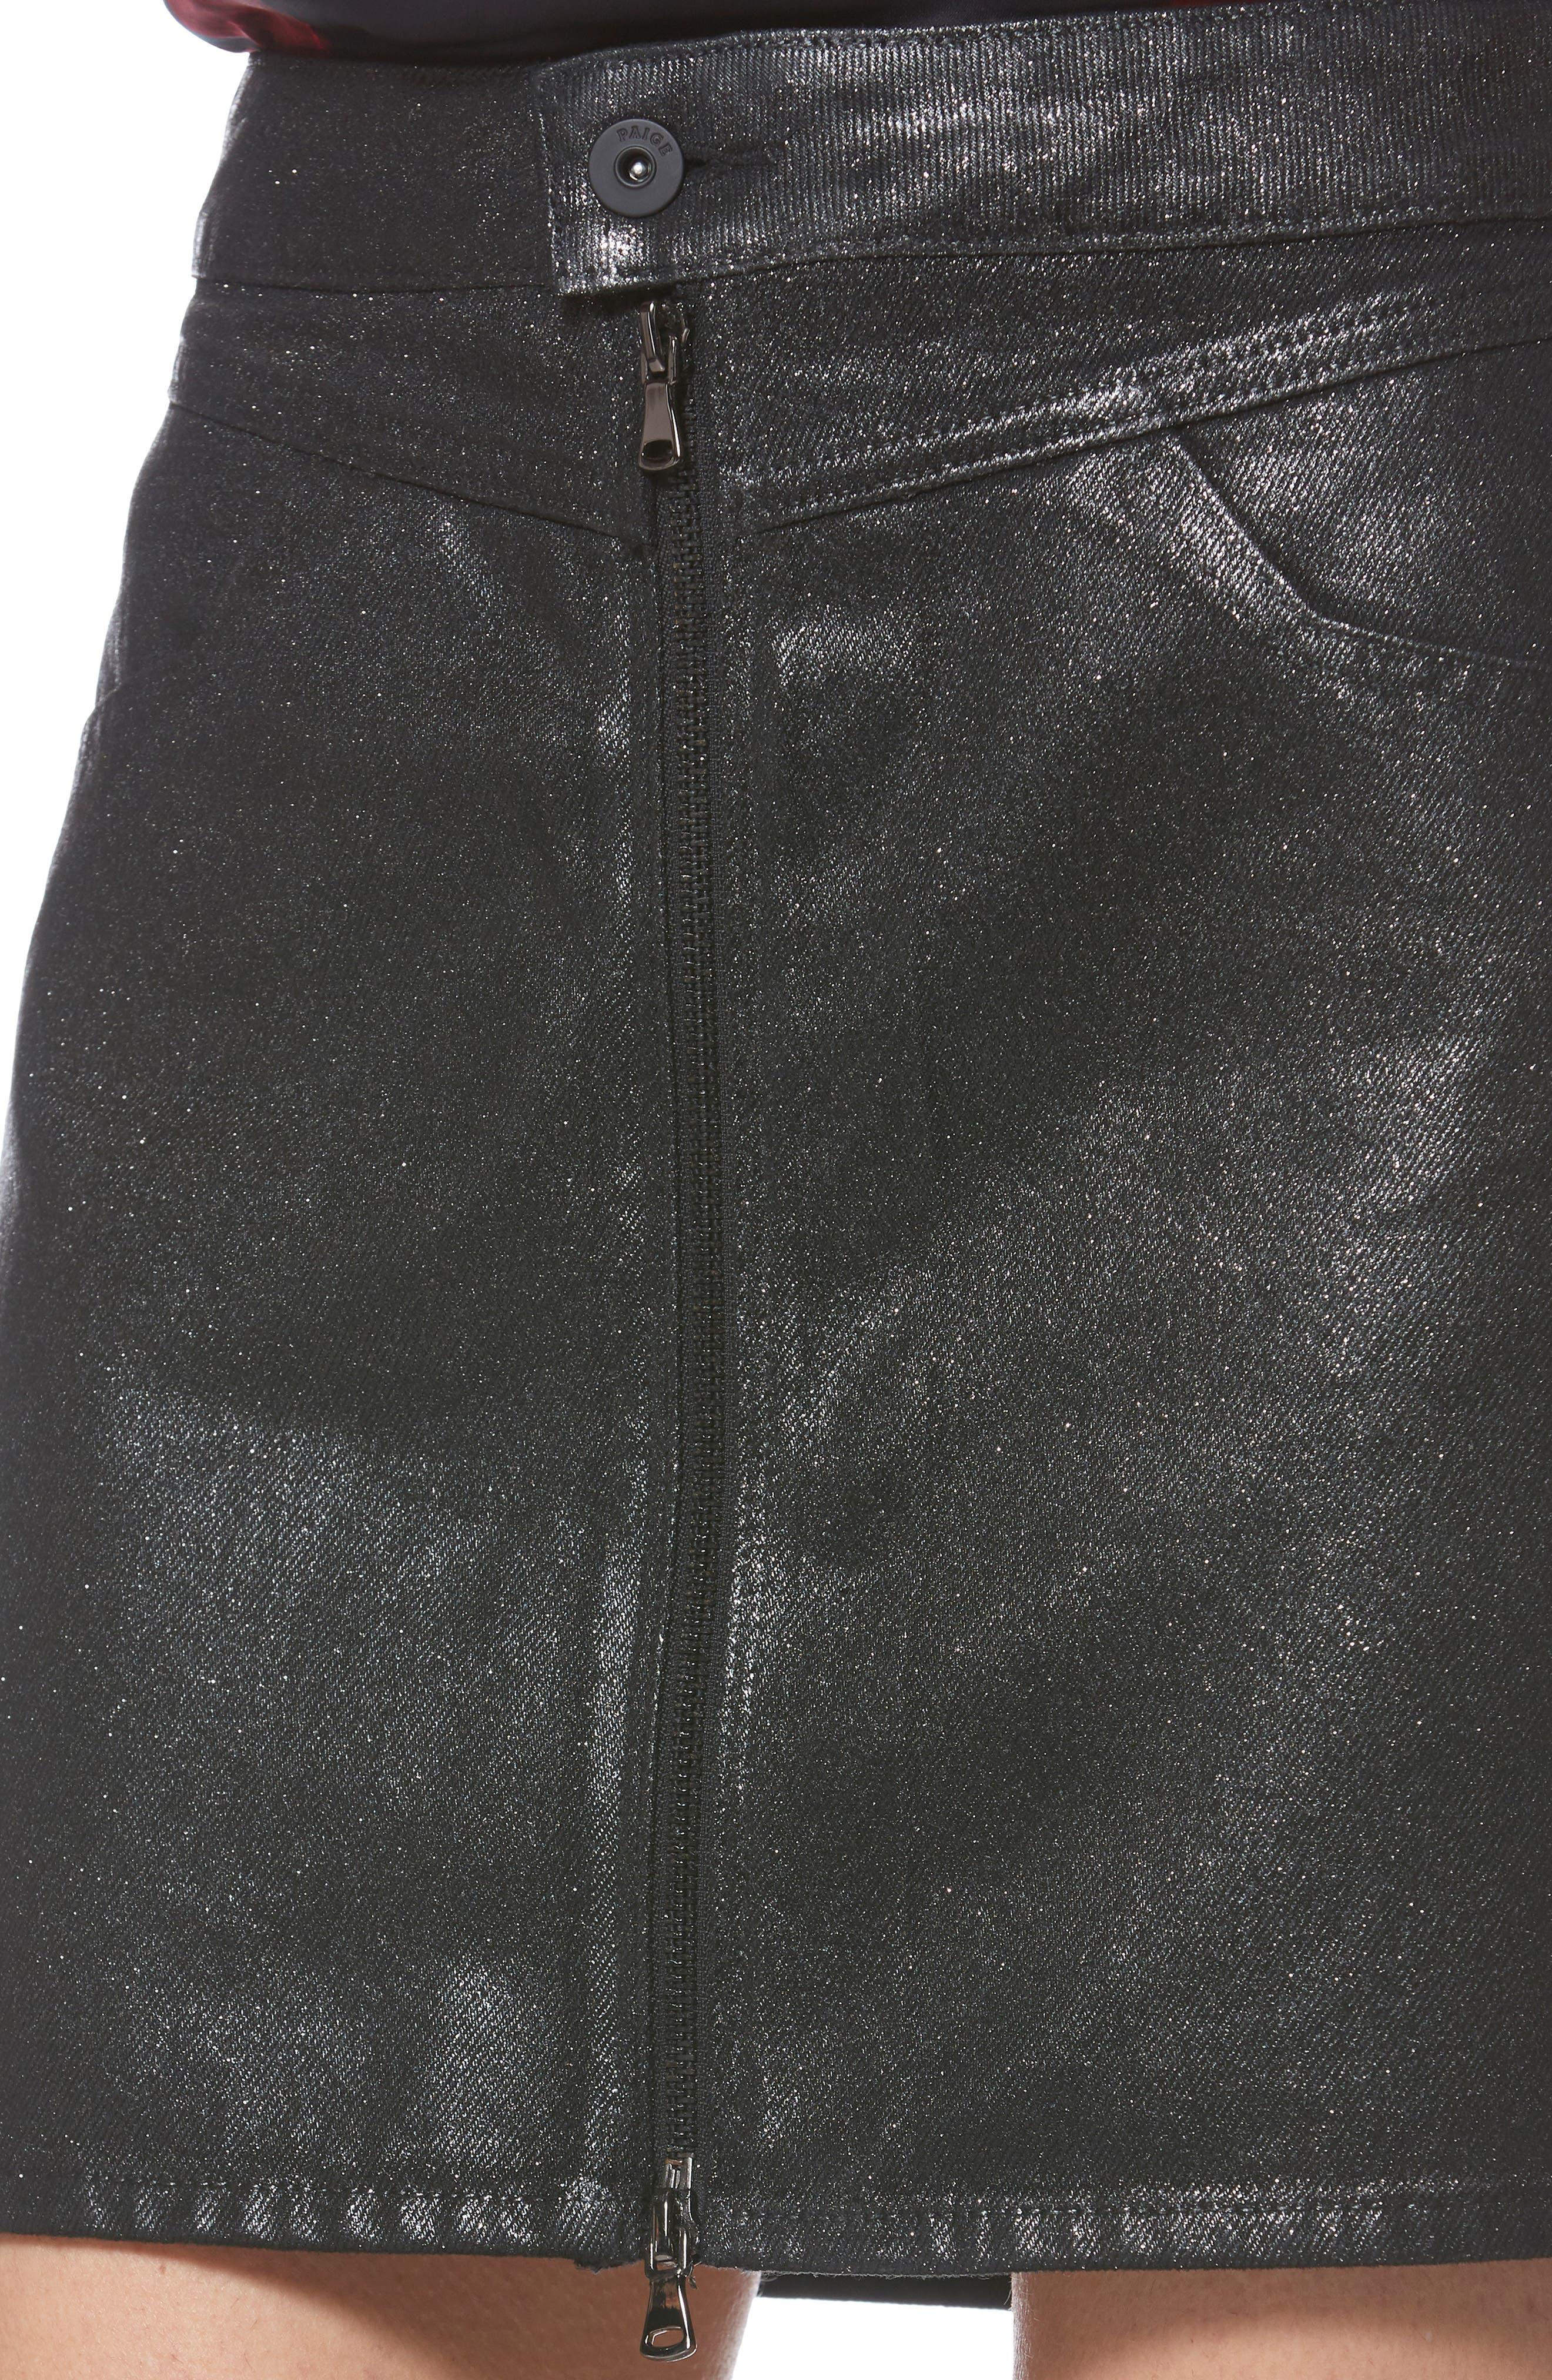 Jamine Zip Front Skirt,                             Alternate thumbnail 4, color,                             SPARKLE COATING